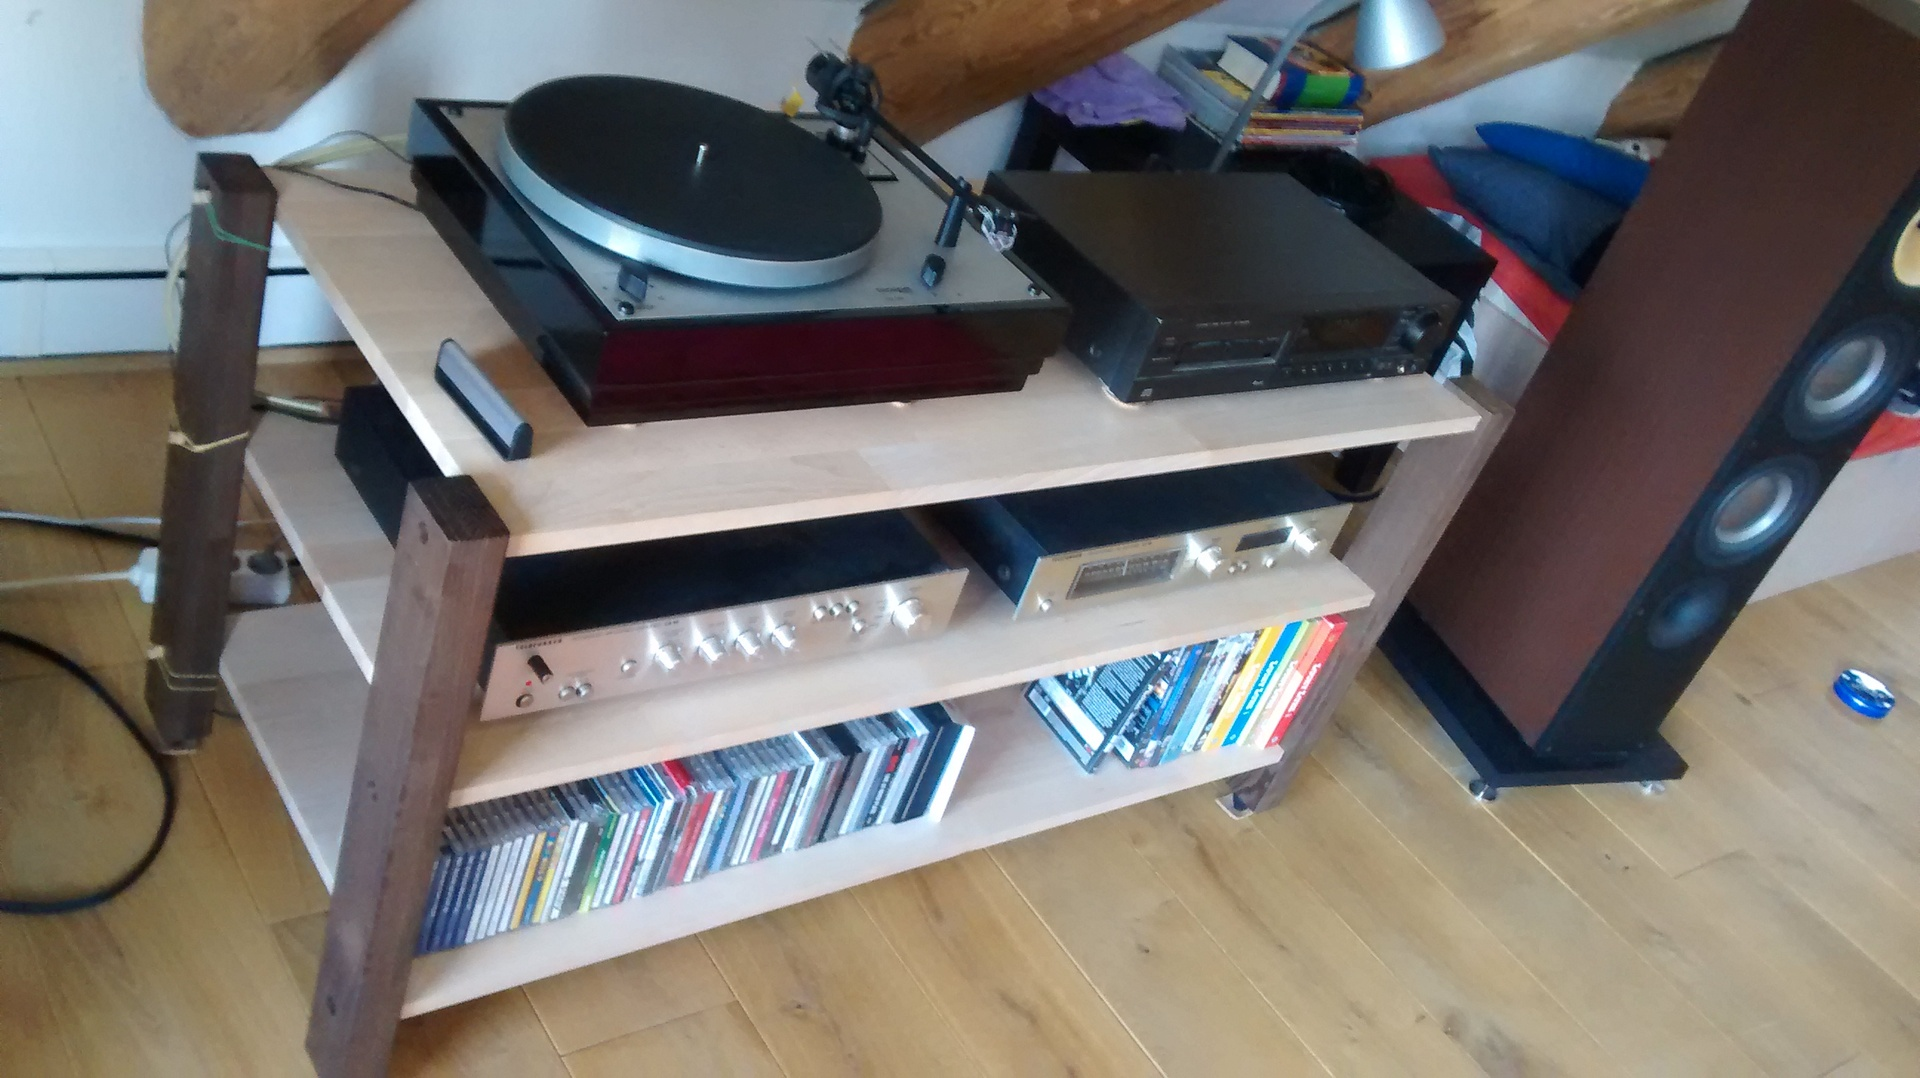 selbstbau rack iii diy iii lowboard notrebo rack rasa selbstbau selbstbaurack tabula. Black Bedroom Furniture Sets. Home Design Ideas